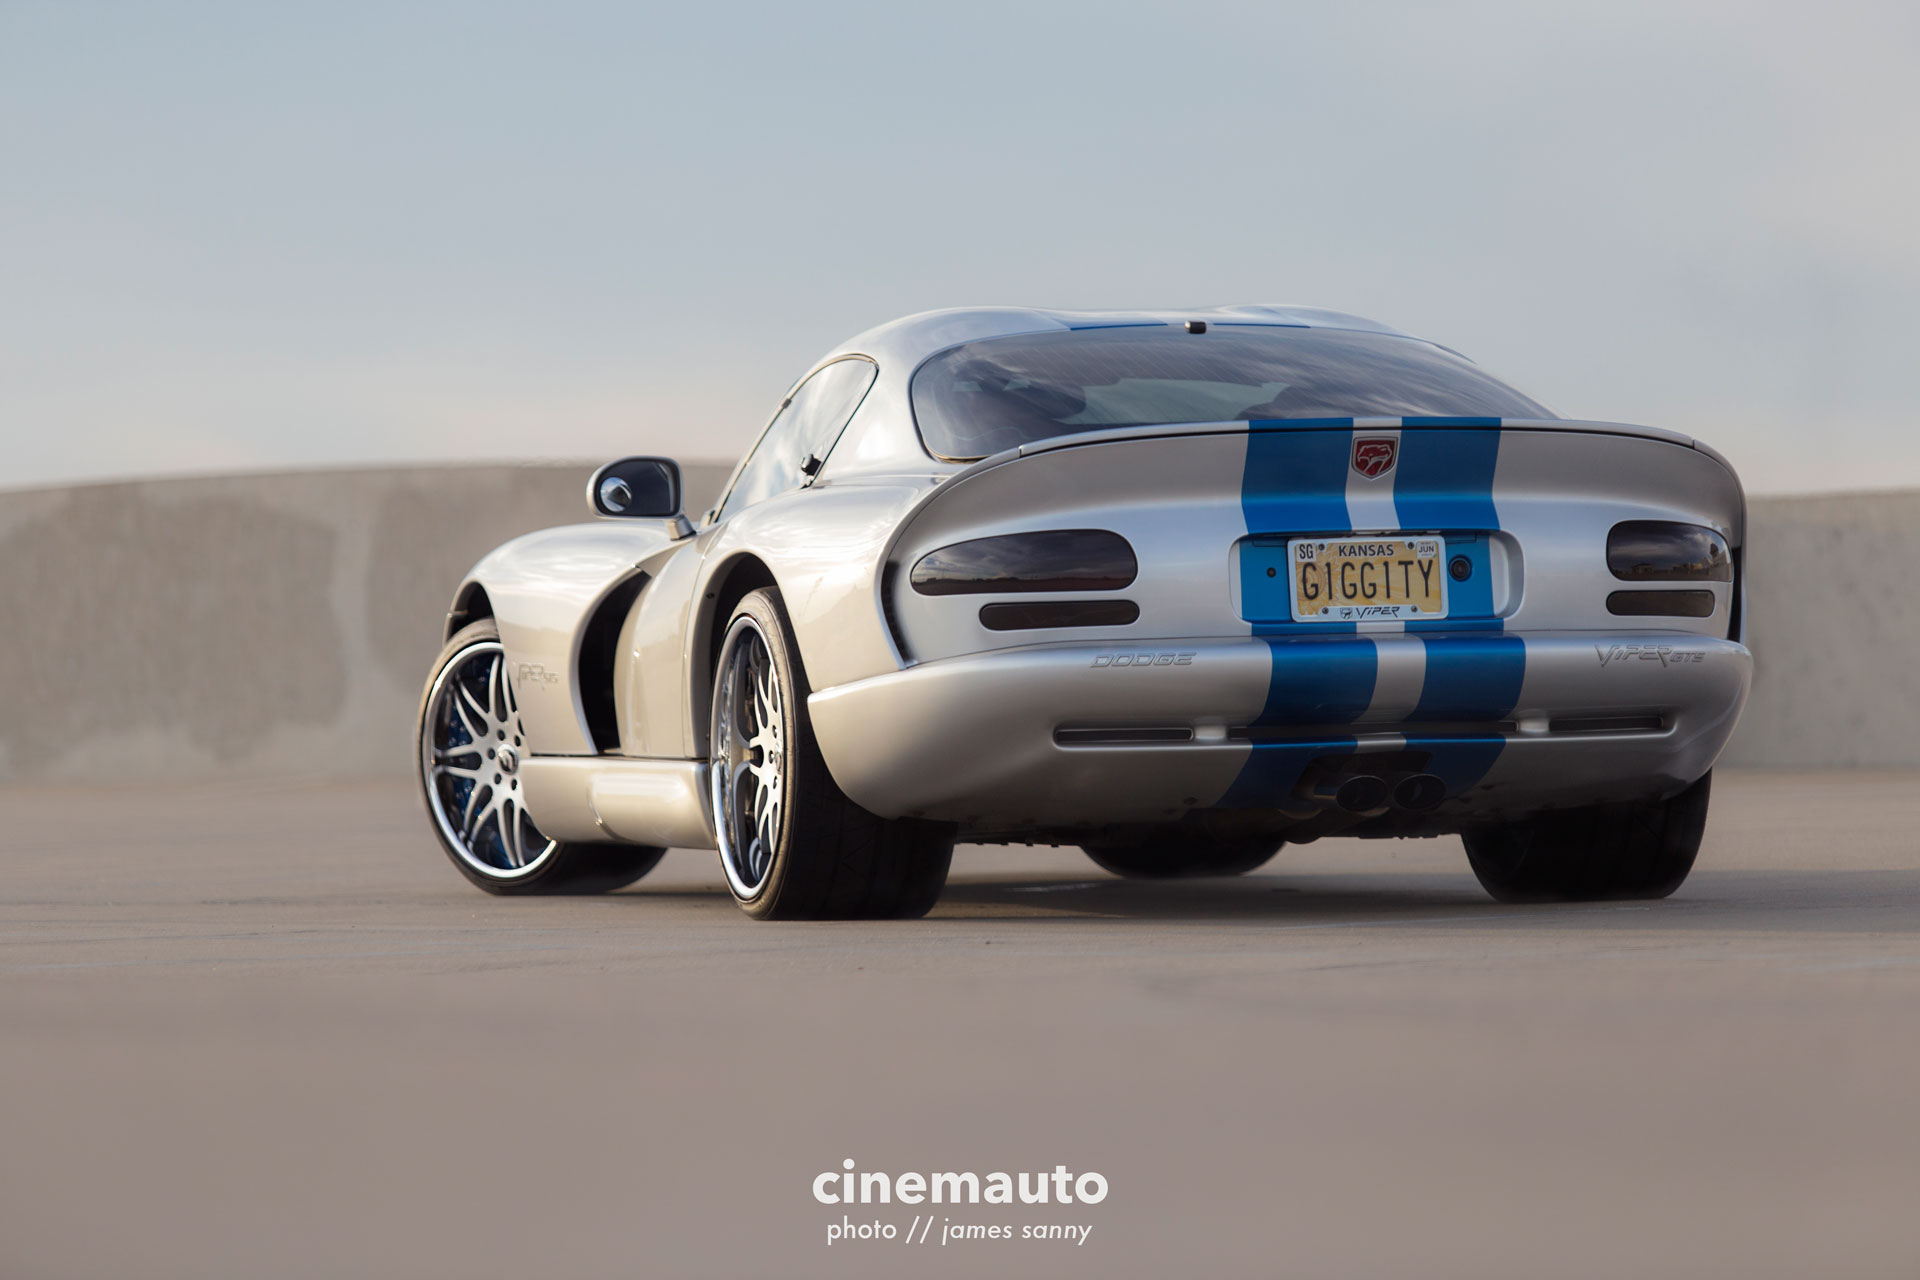 cinemauto-wichita-automotive-photography-ah8-sm.jpg